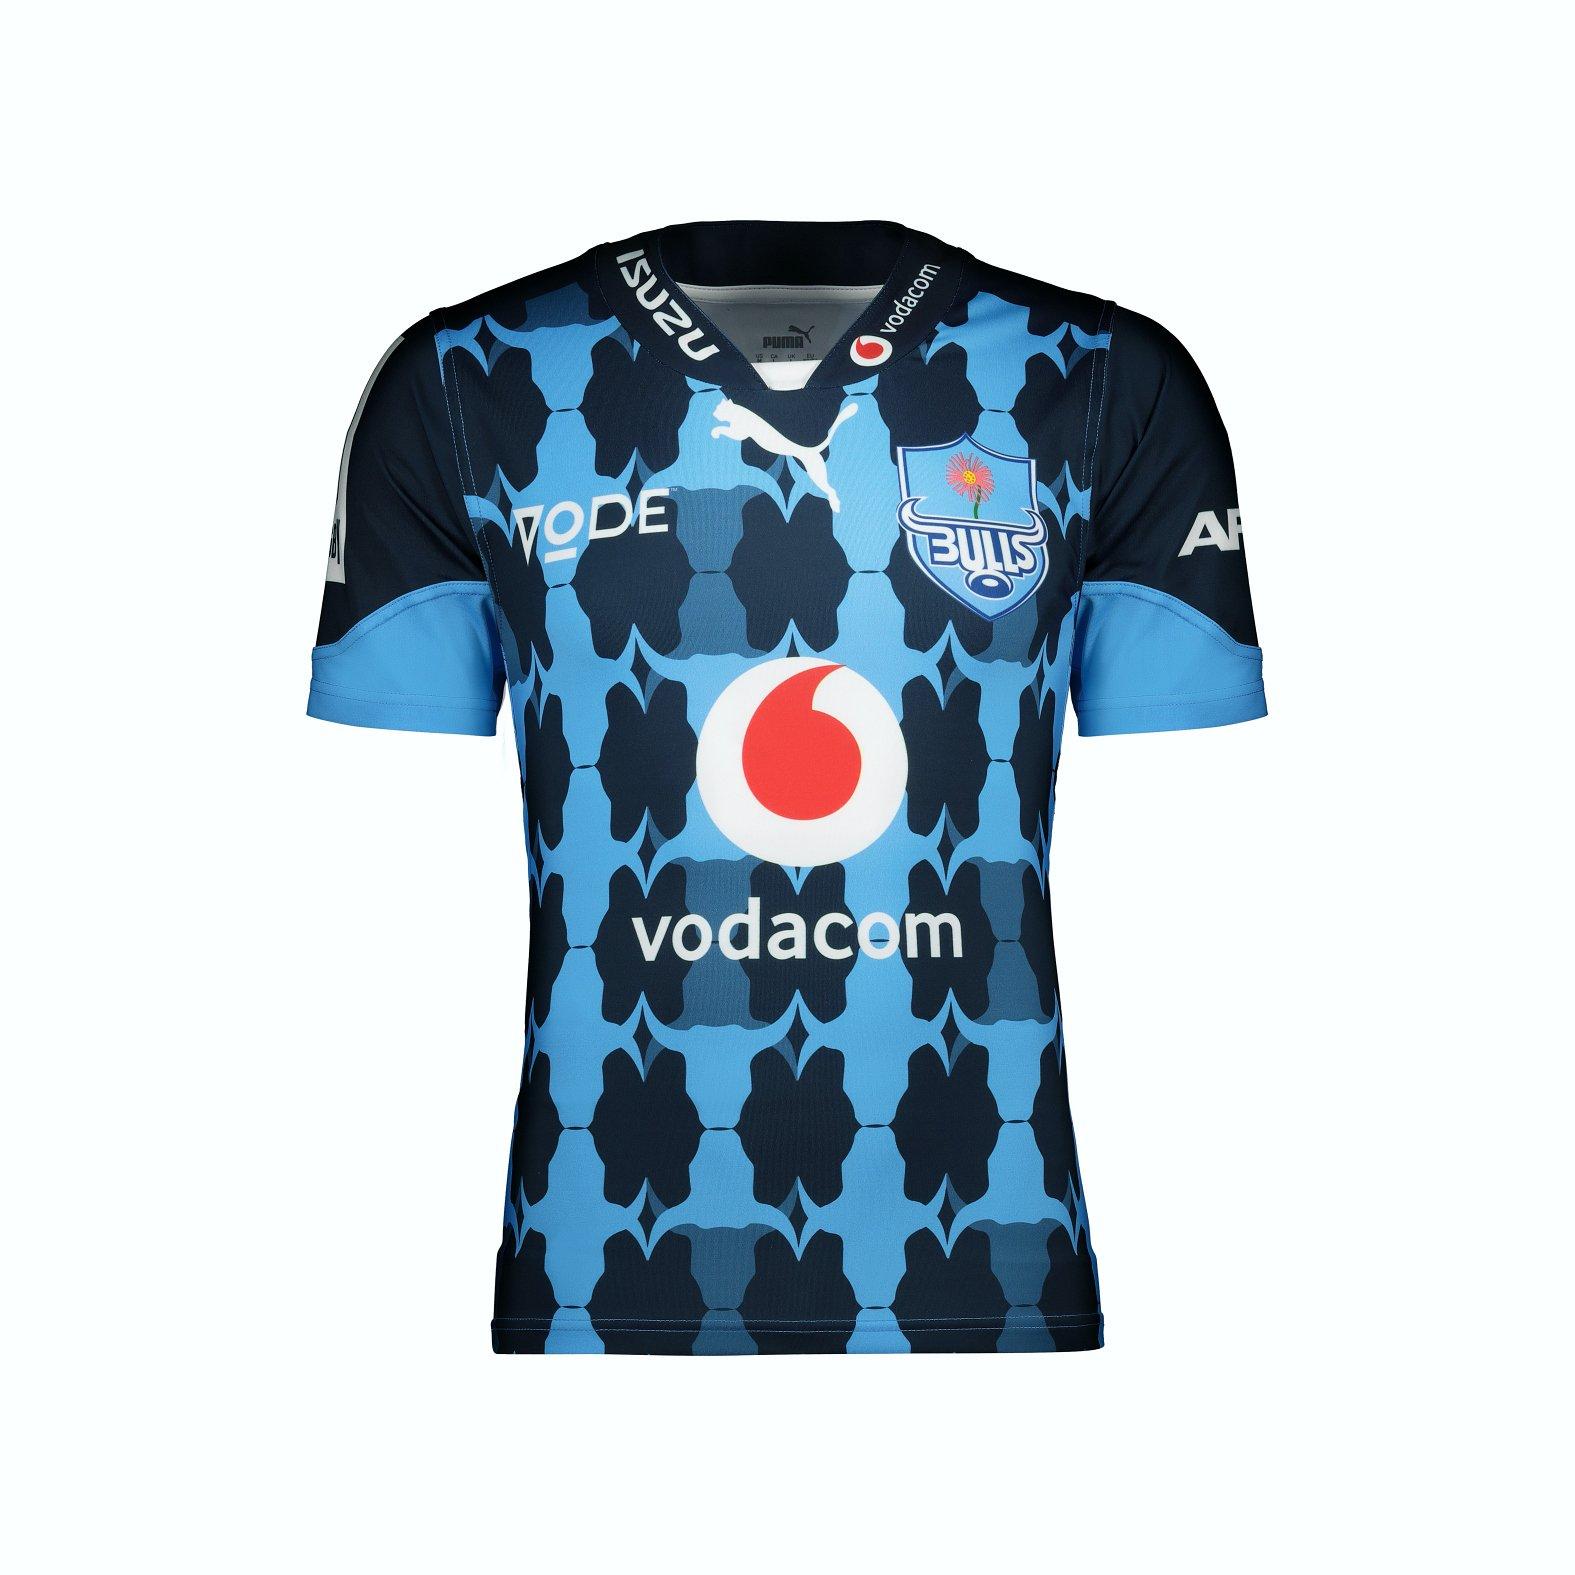 Bulls Puma Vodacom